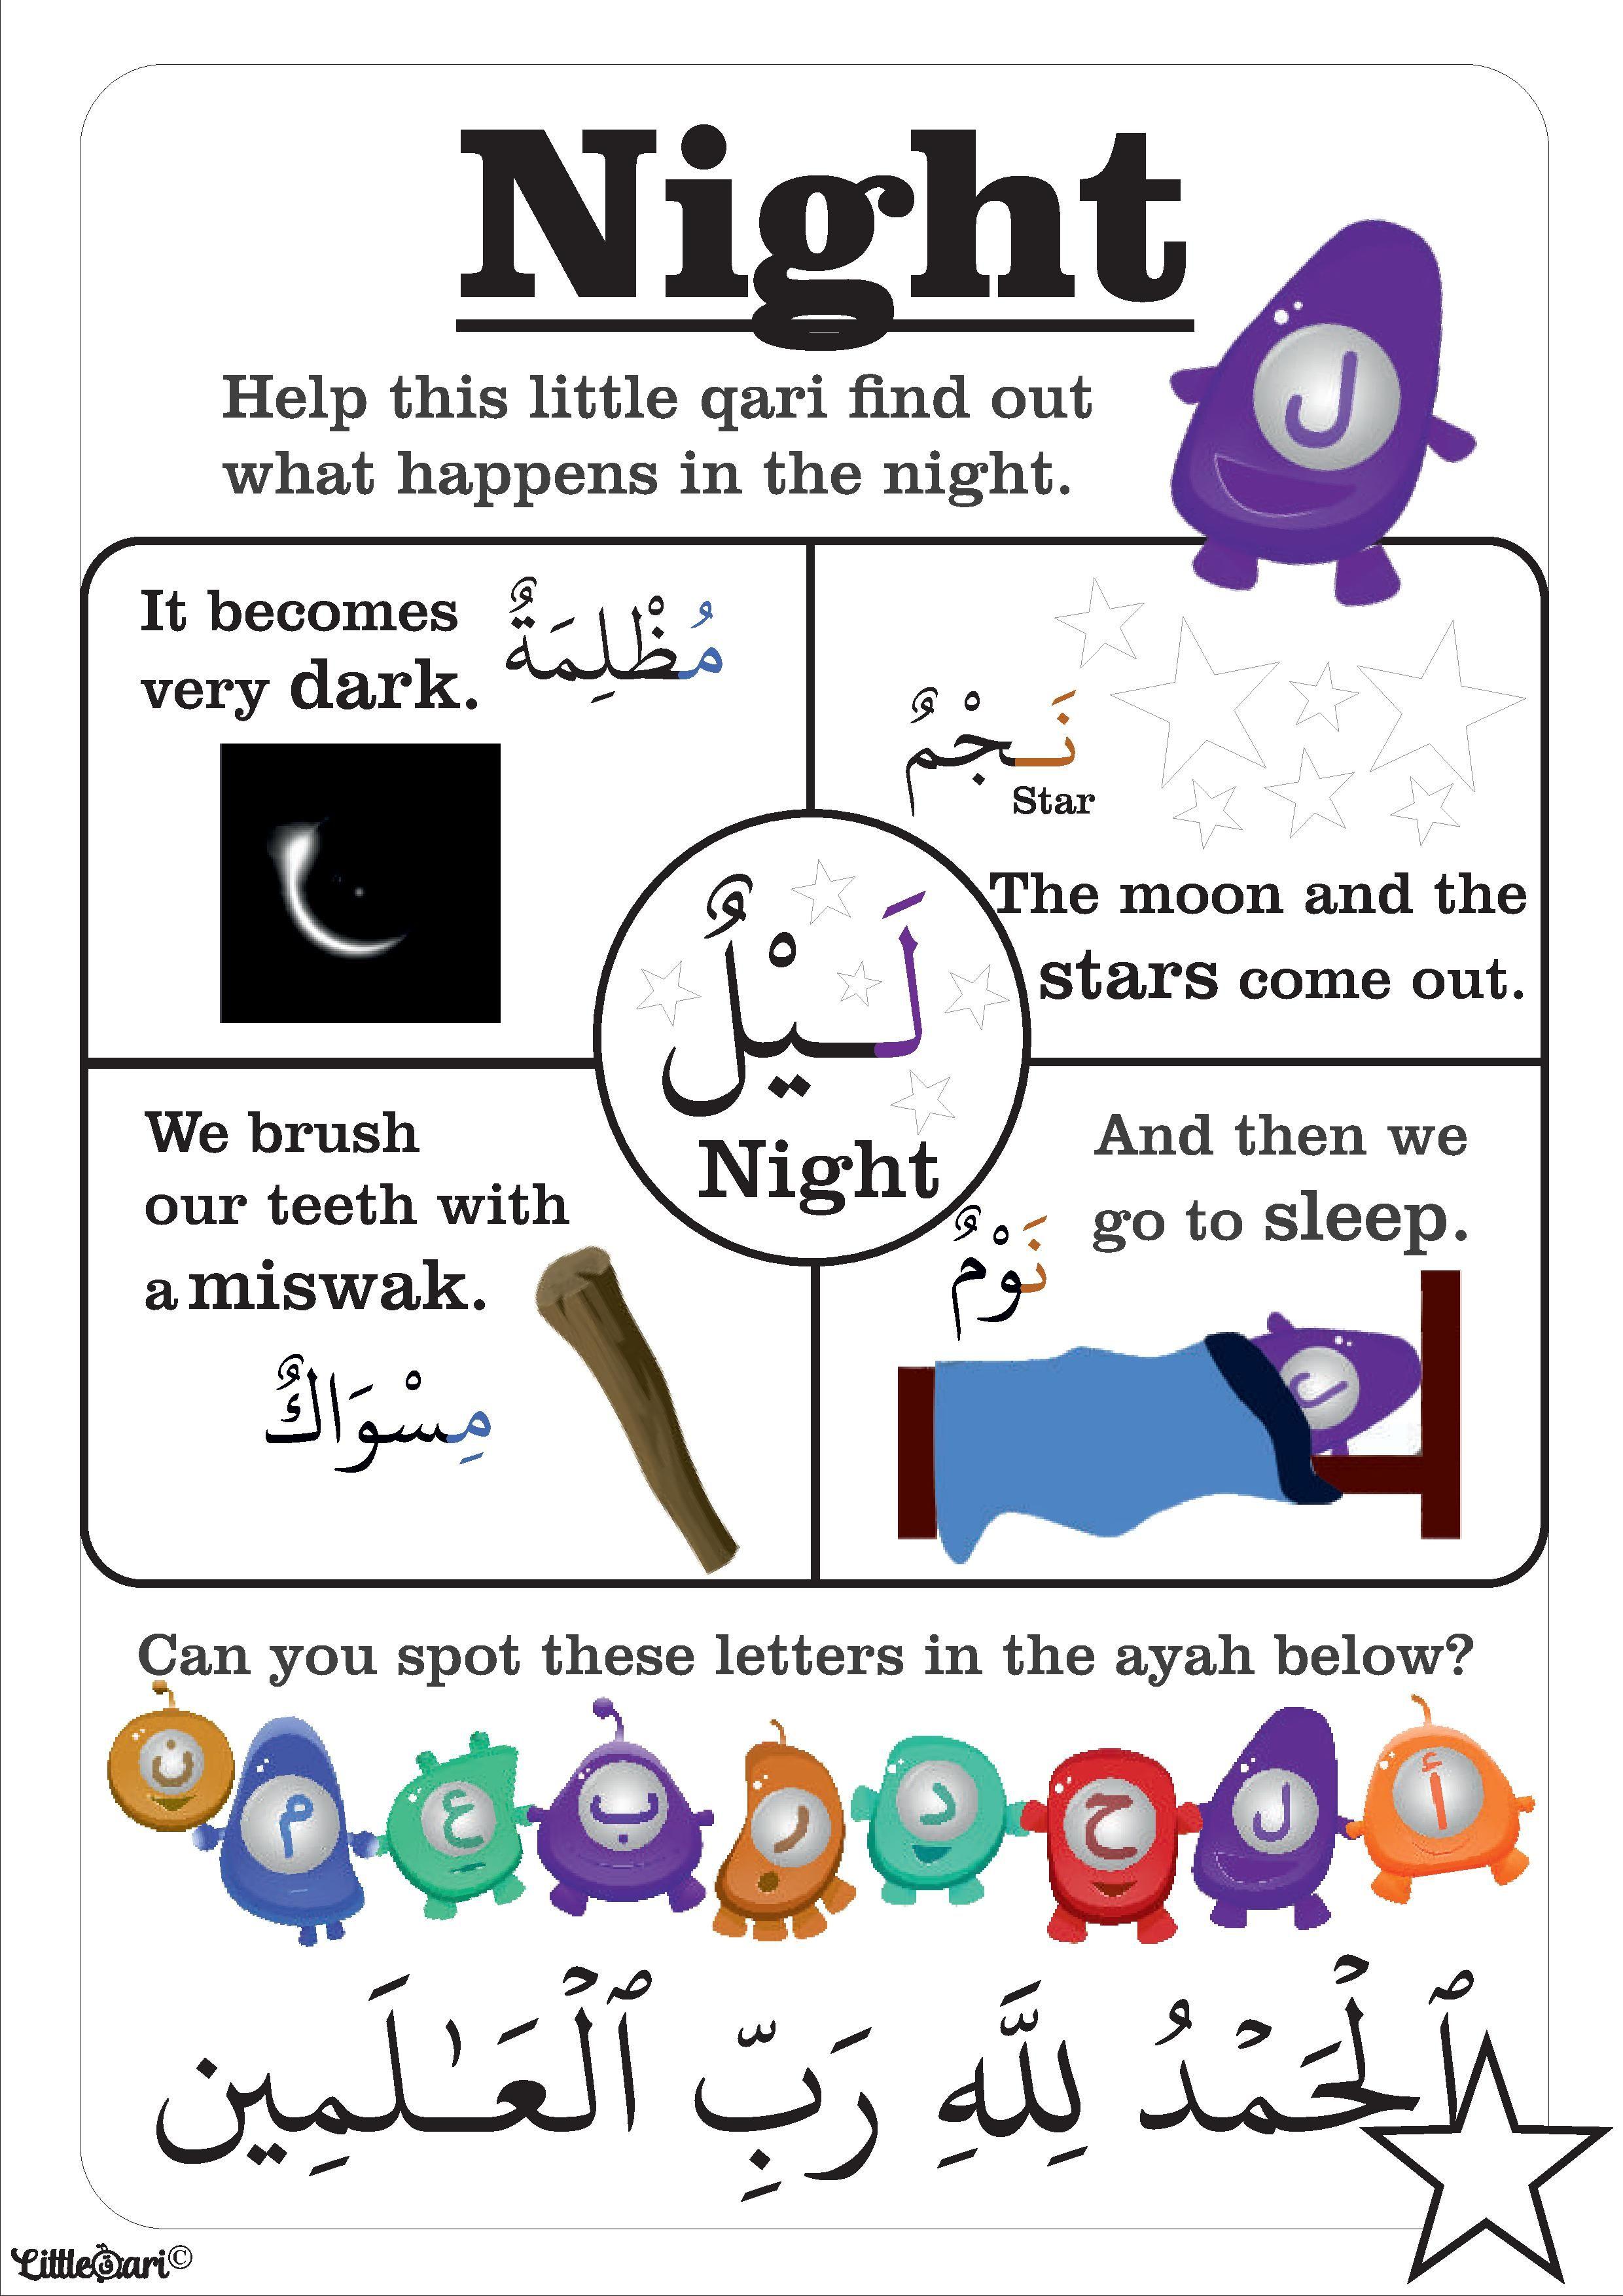 62 Laam Arabic Alphabet Littleqari Http Eepurl Com C Qw95 Arabic Alphabet For Kids Learning Arabic Language Worksheets